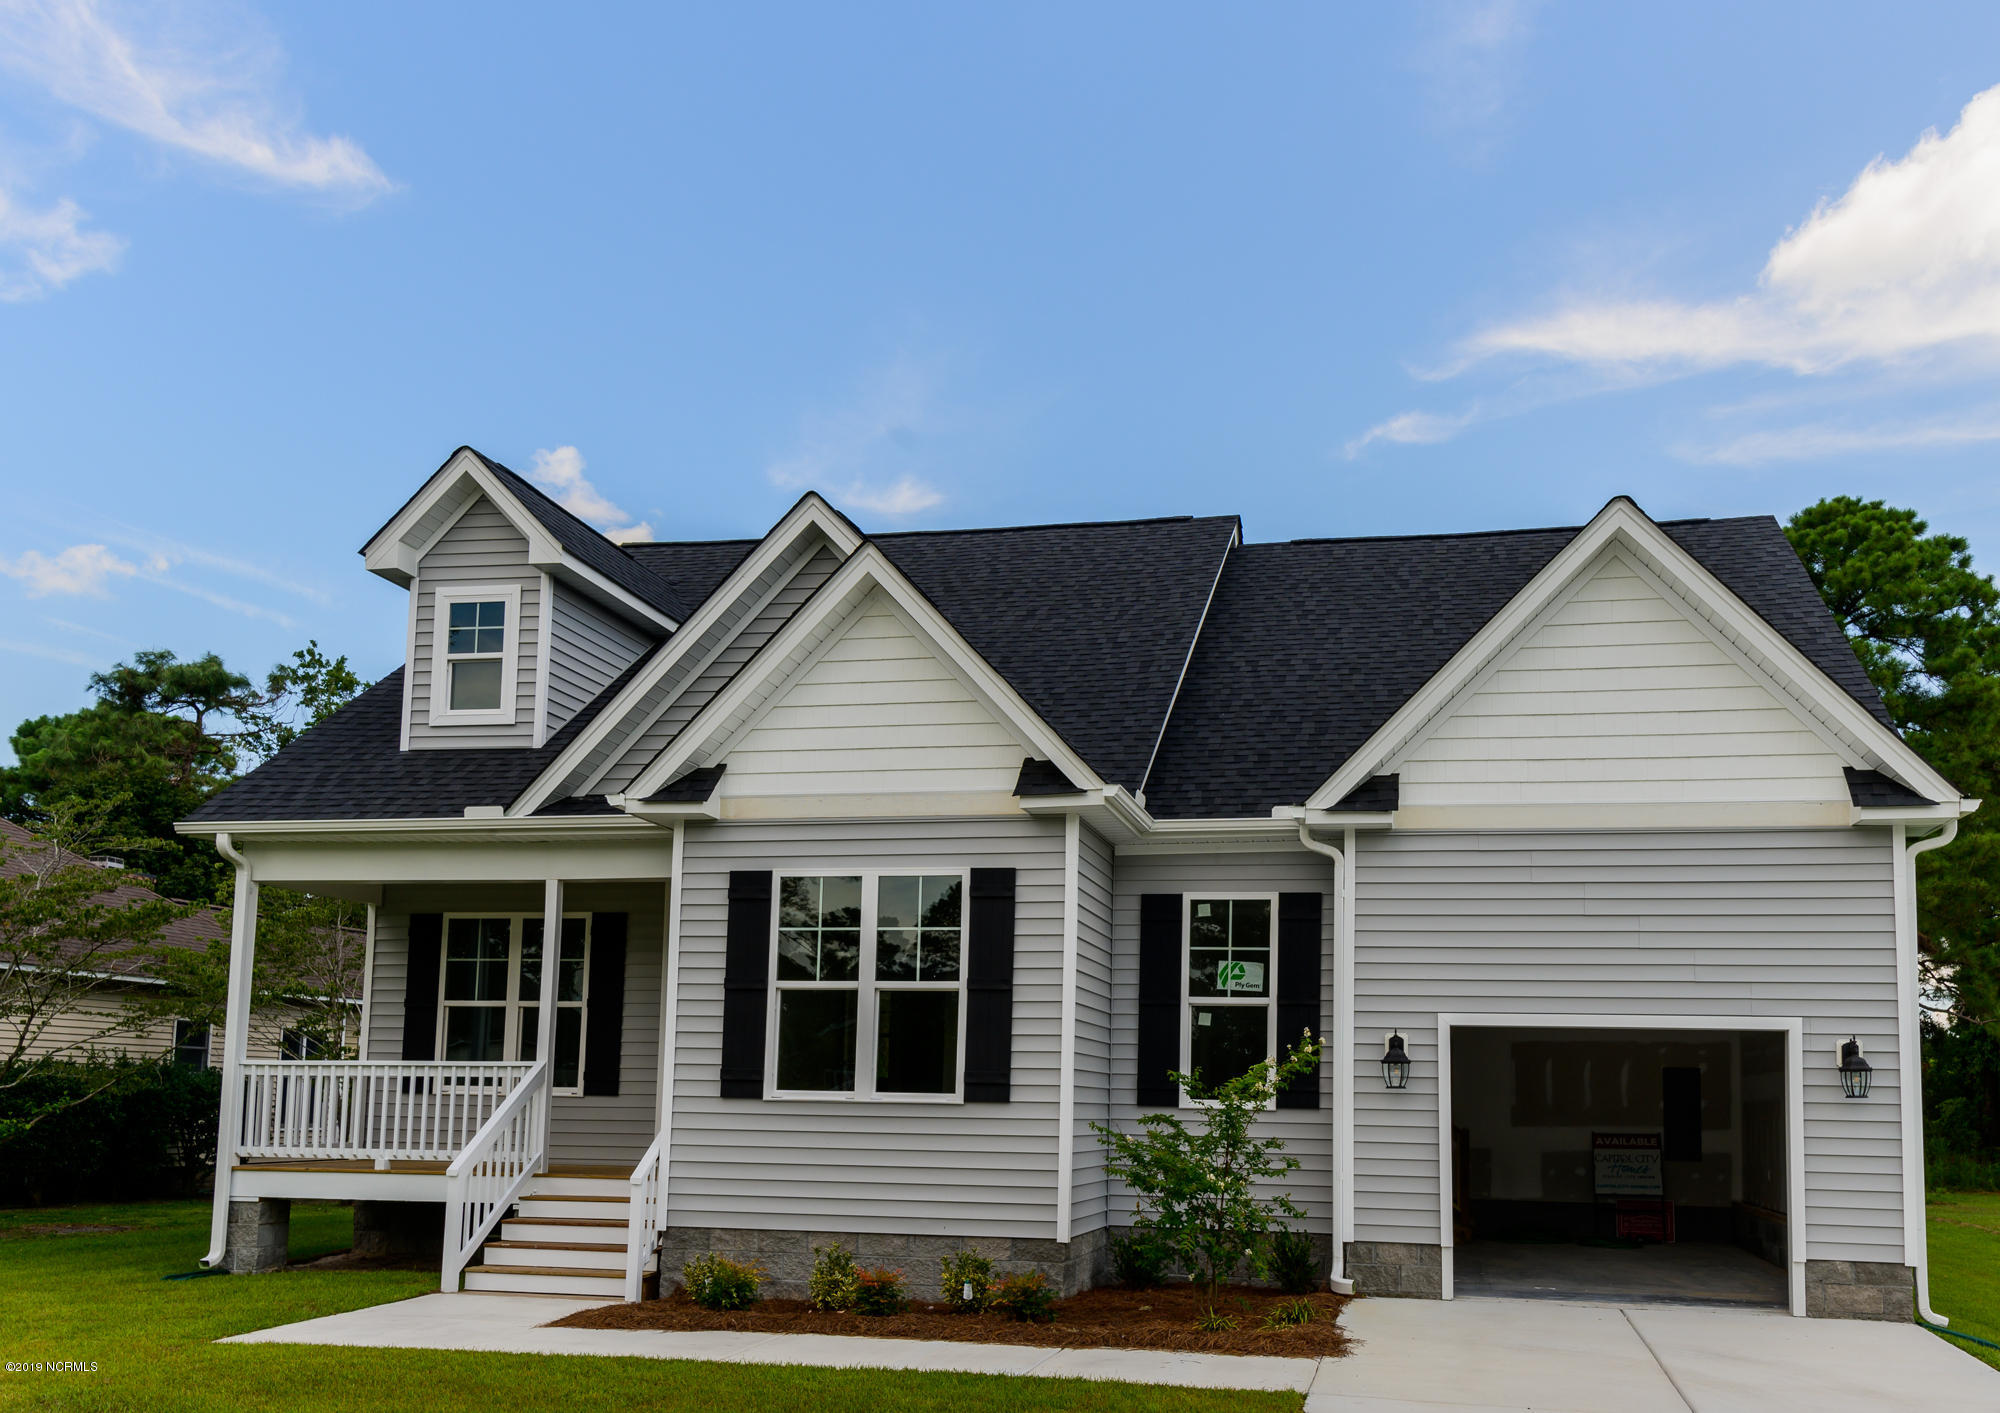 907 Pelican Drive, New Bern, North Carolina 28560, 3 Bedrooms Bedrooms, 7 Rooms Rooms,2 BathroomsBathrooms,Single family residence,For sale,Pelican,100180257